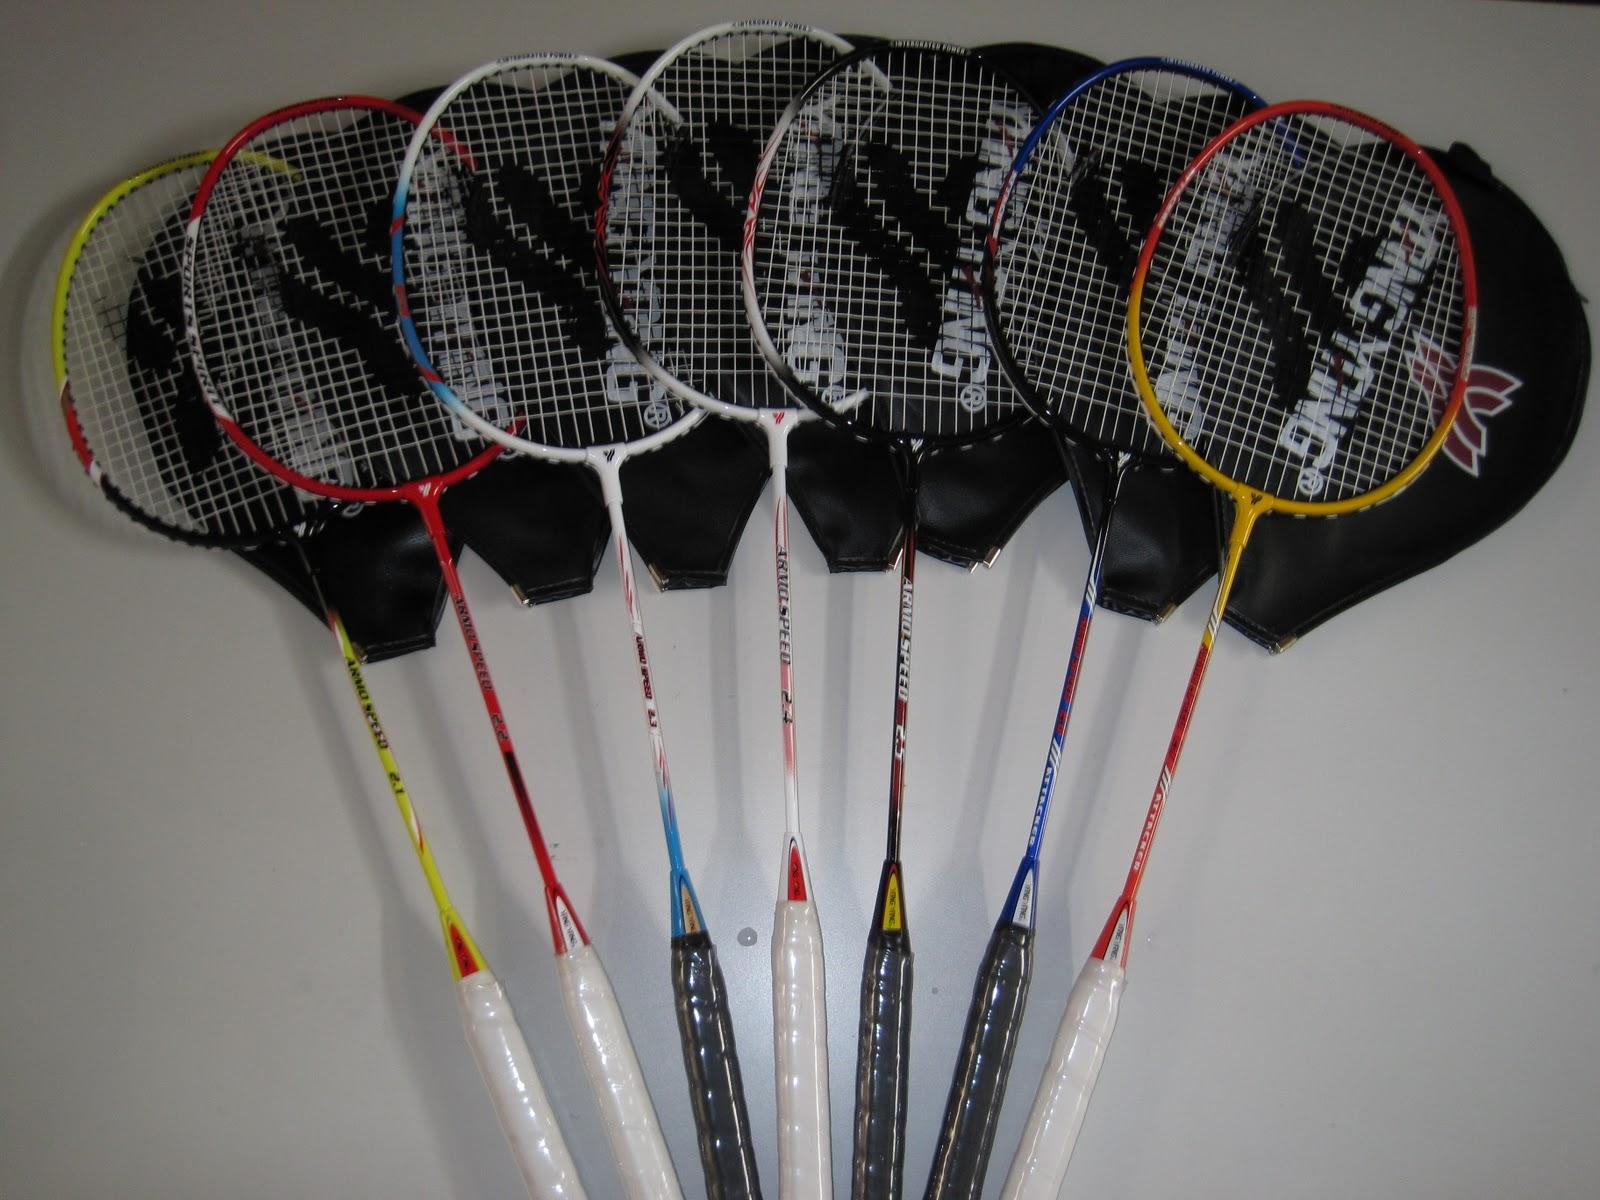 Yang Yang Sportsware Review: Yang Yang Latest Racquets